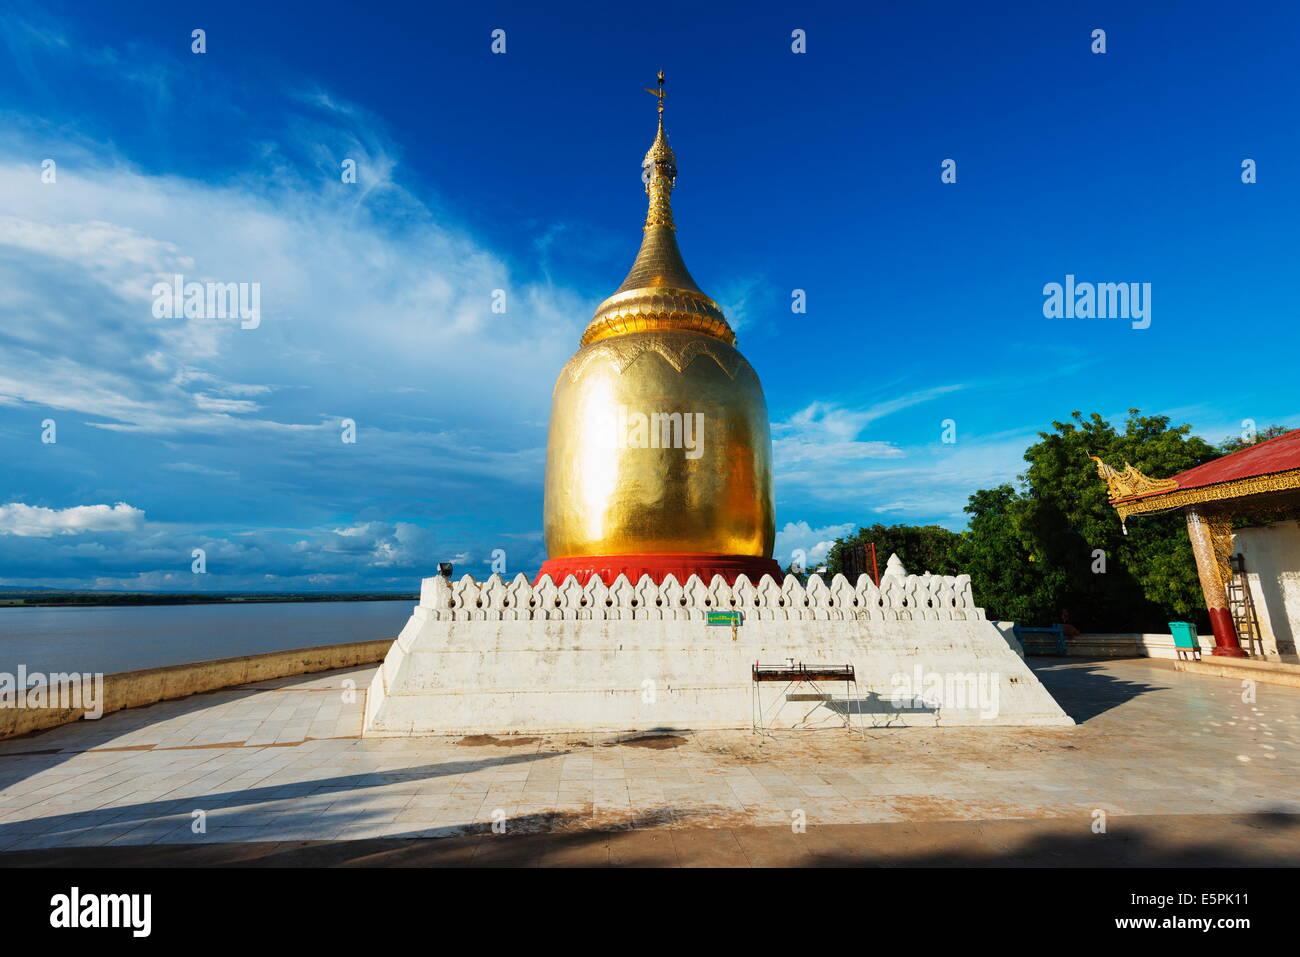 Bupaya Pagoda, Bagan (Pagan), Myanmar (Burma), Asia - Stock Image